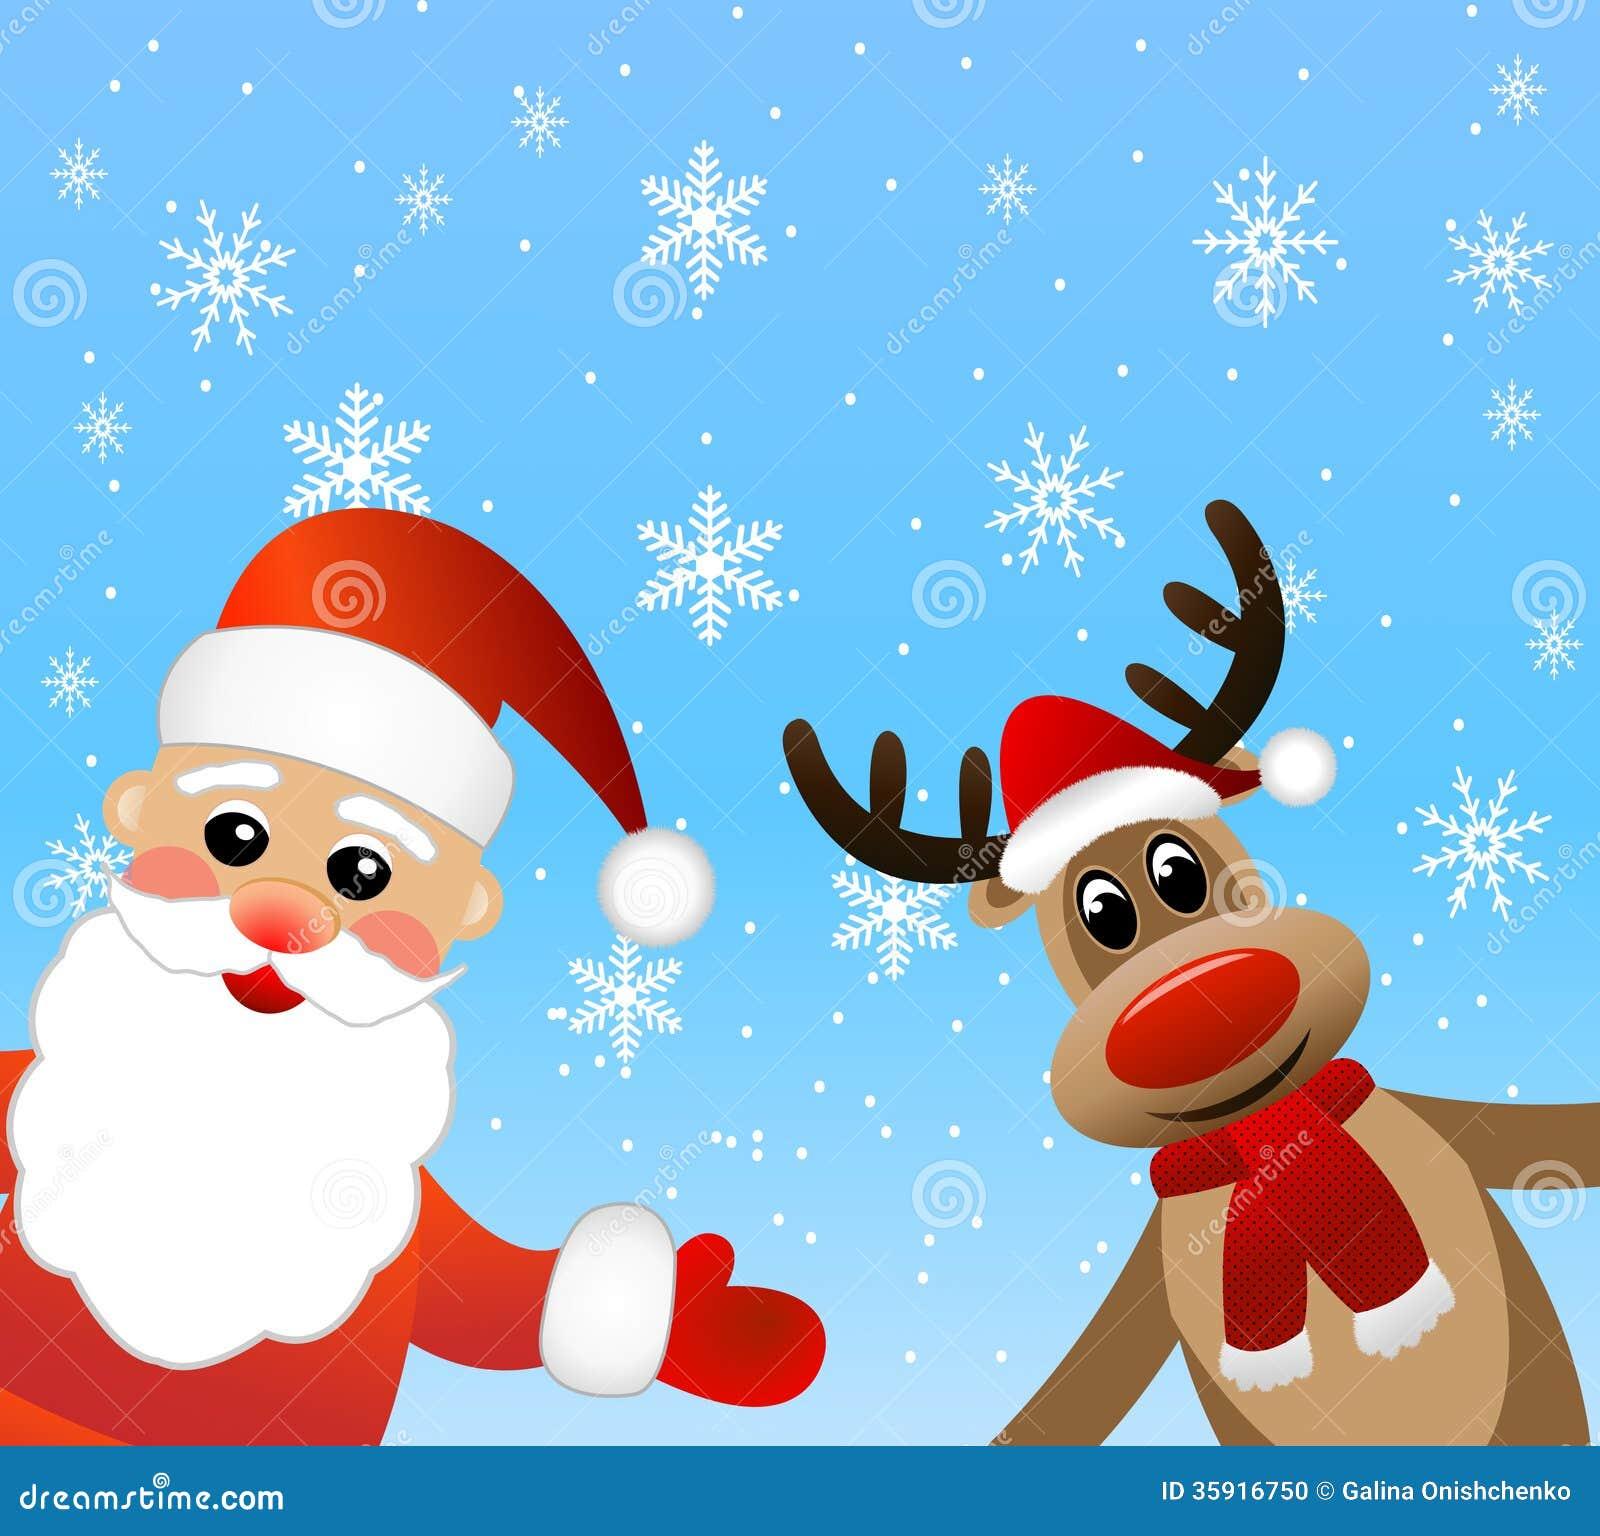 Santa Claus And Deer Stock Photo Image 35916750